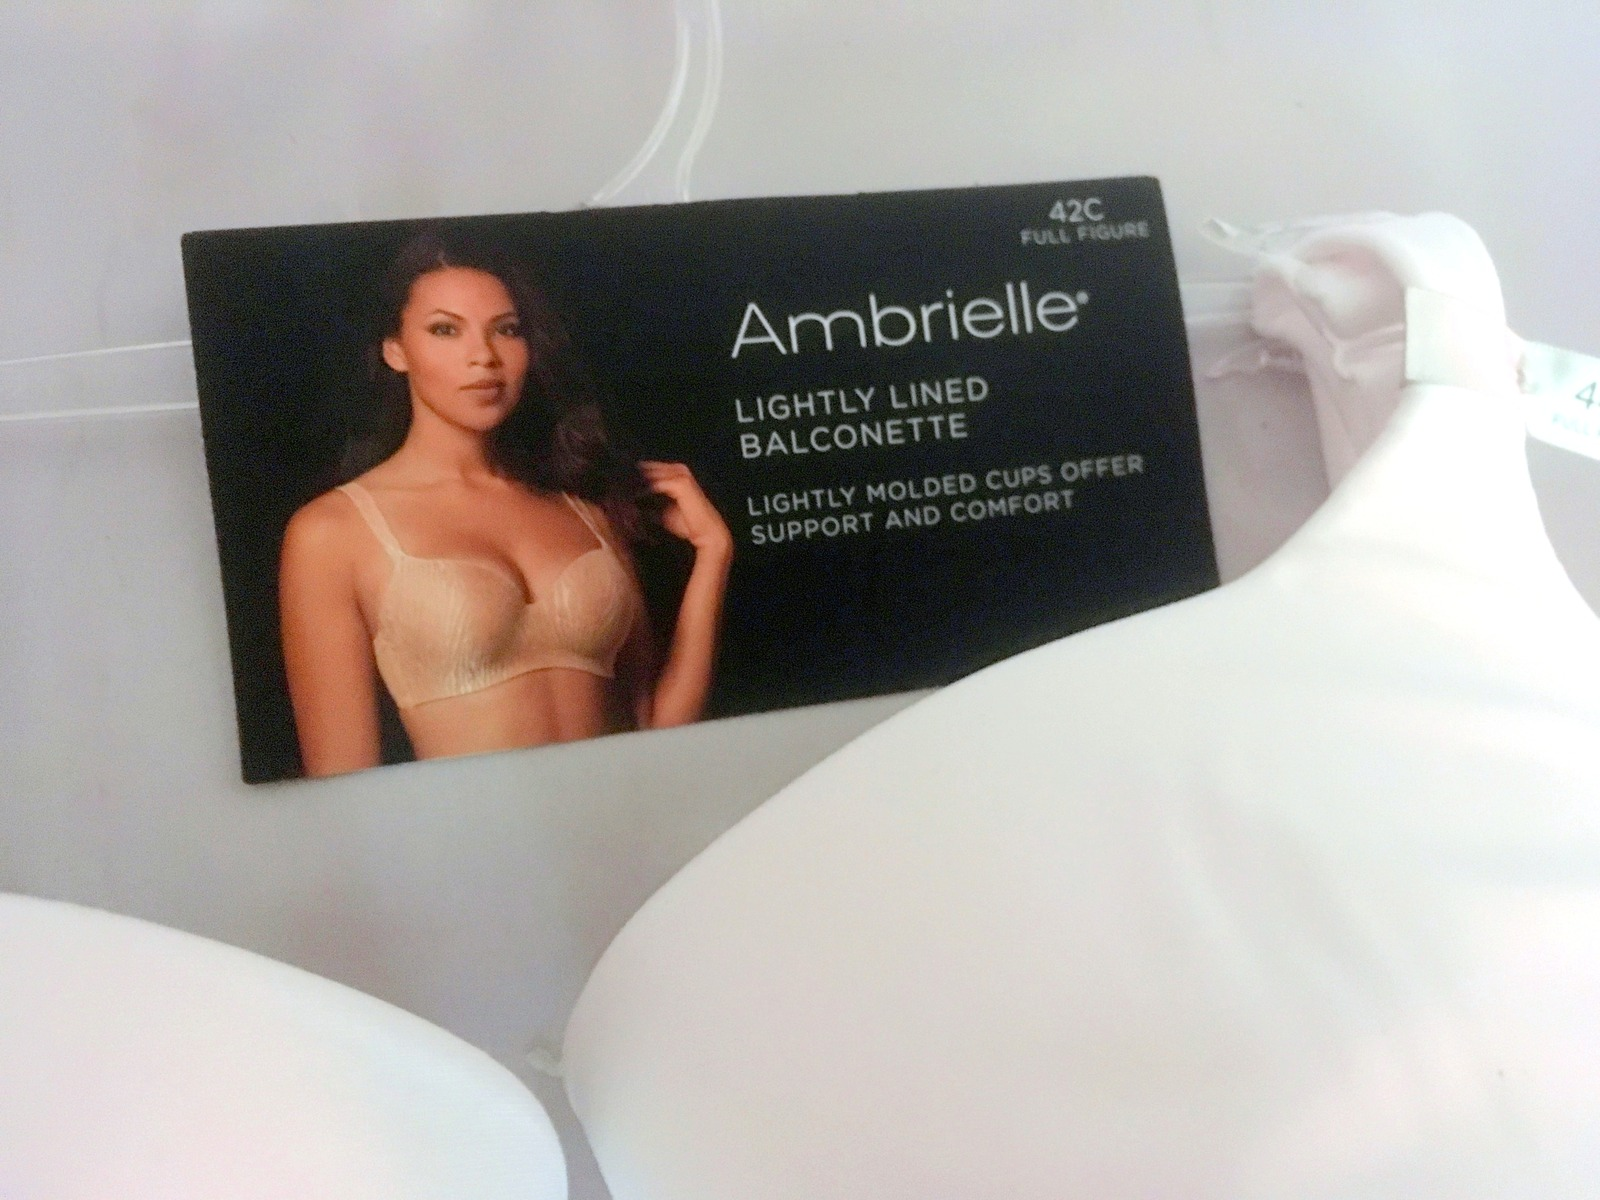 8a8010811c White Bra, Ambrielle, 44C, Balconette, Full and 50 similar items